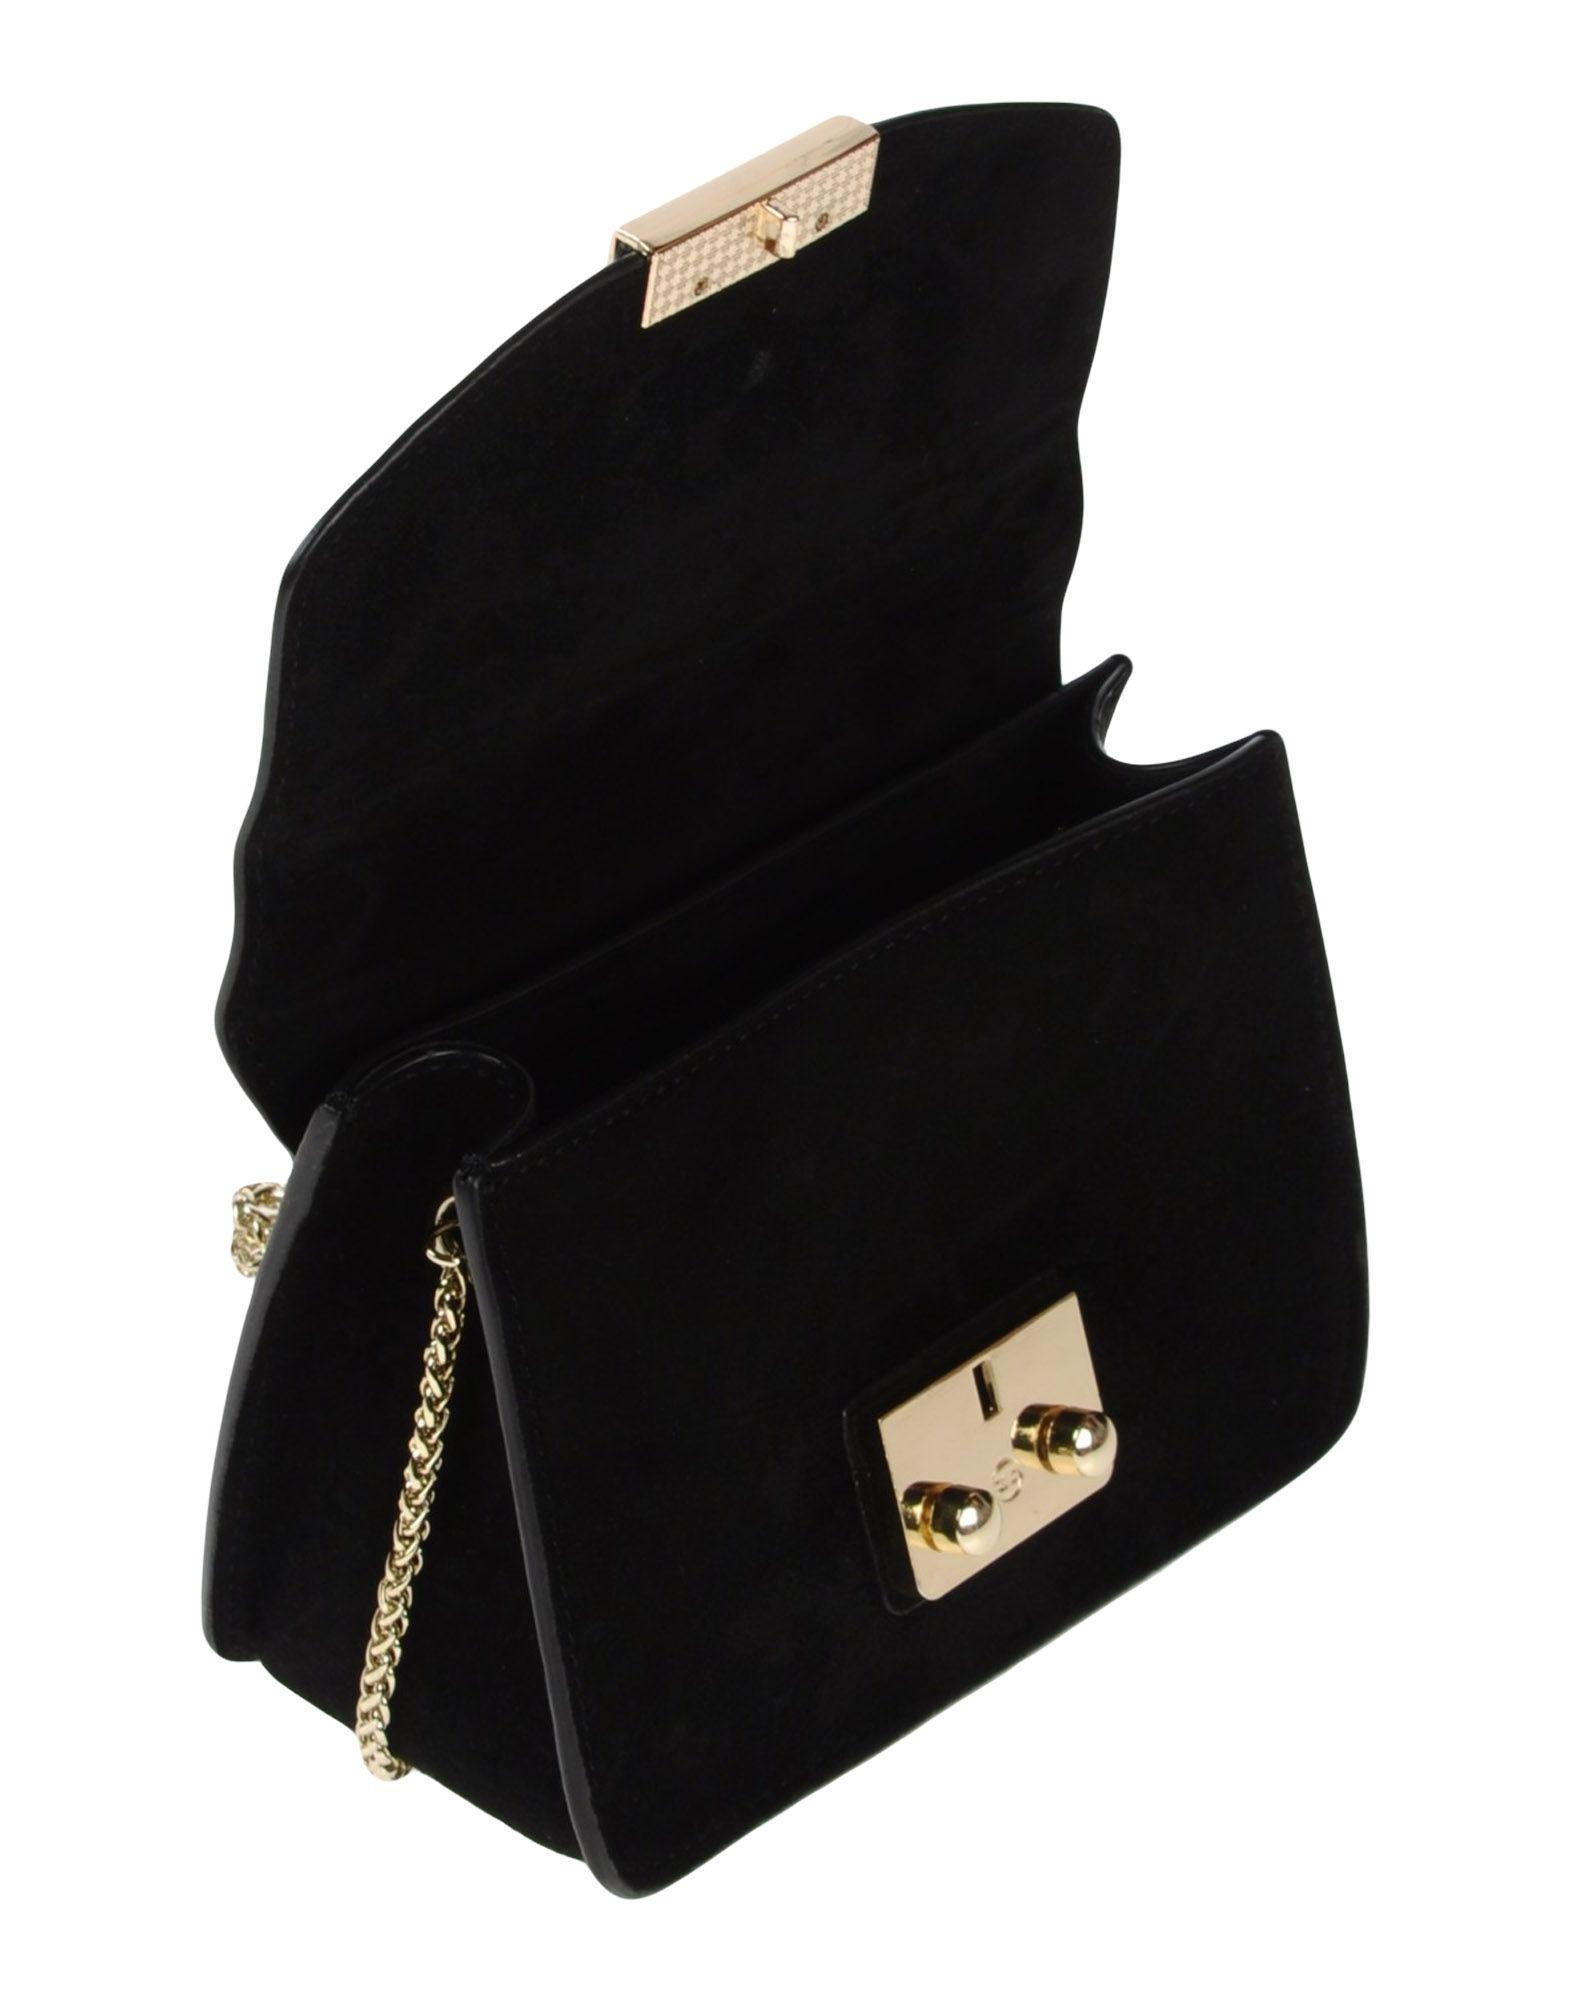 Lola Cruz Leather Cross-body Bag in Black